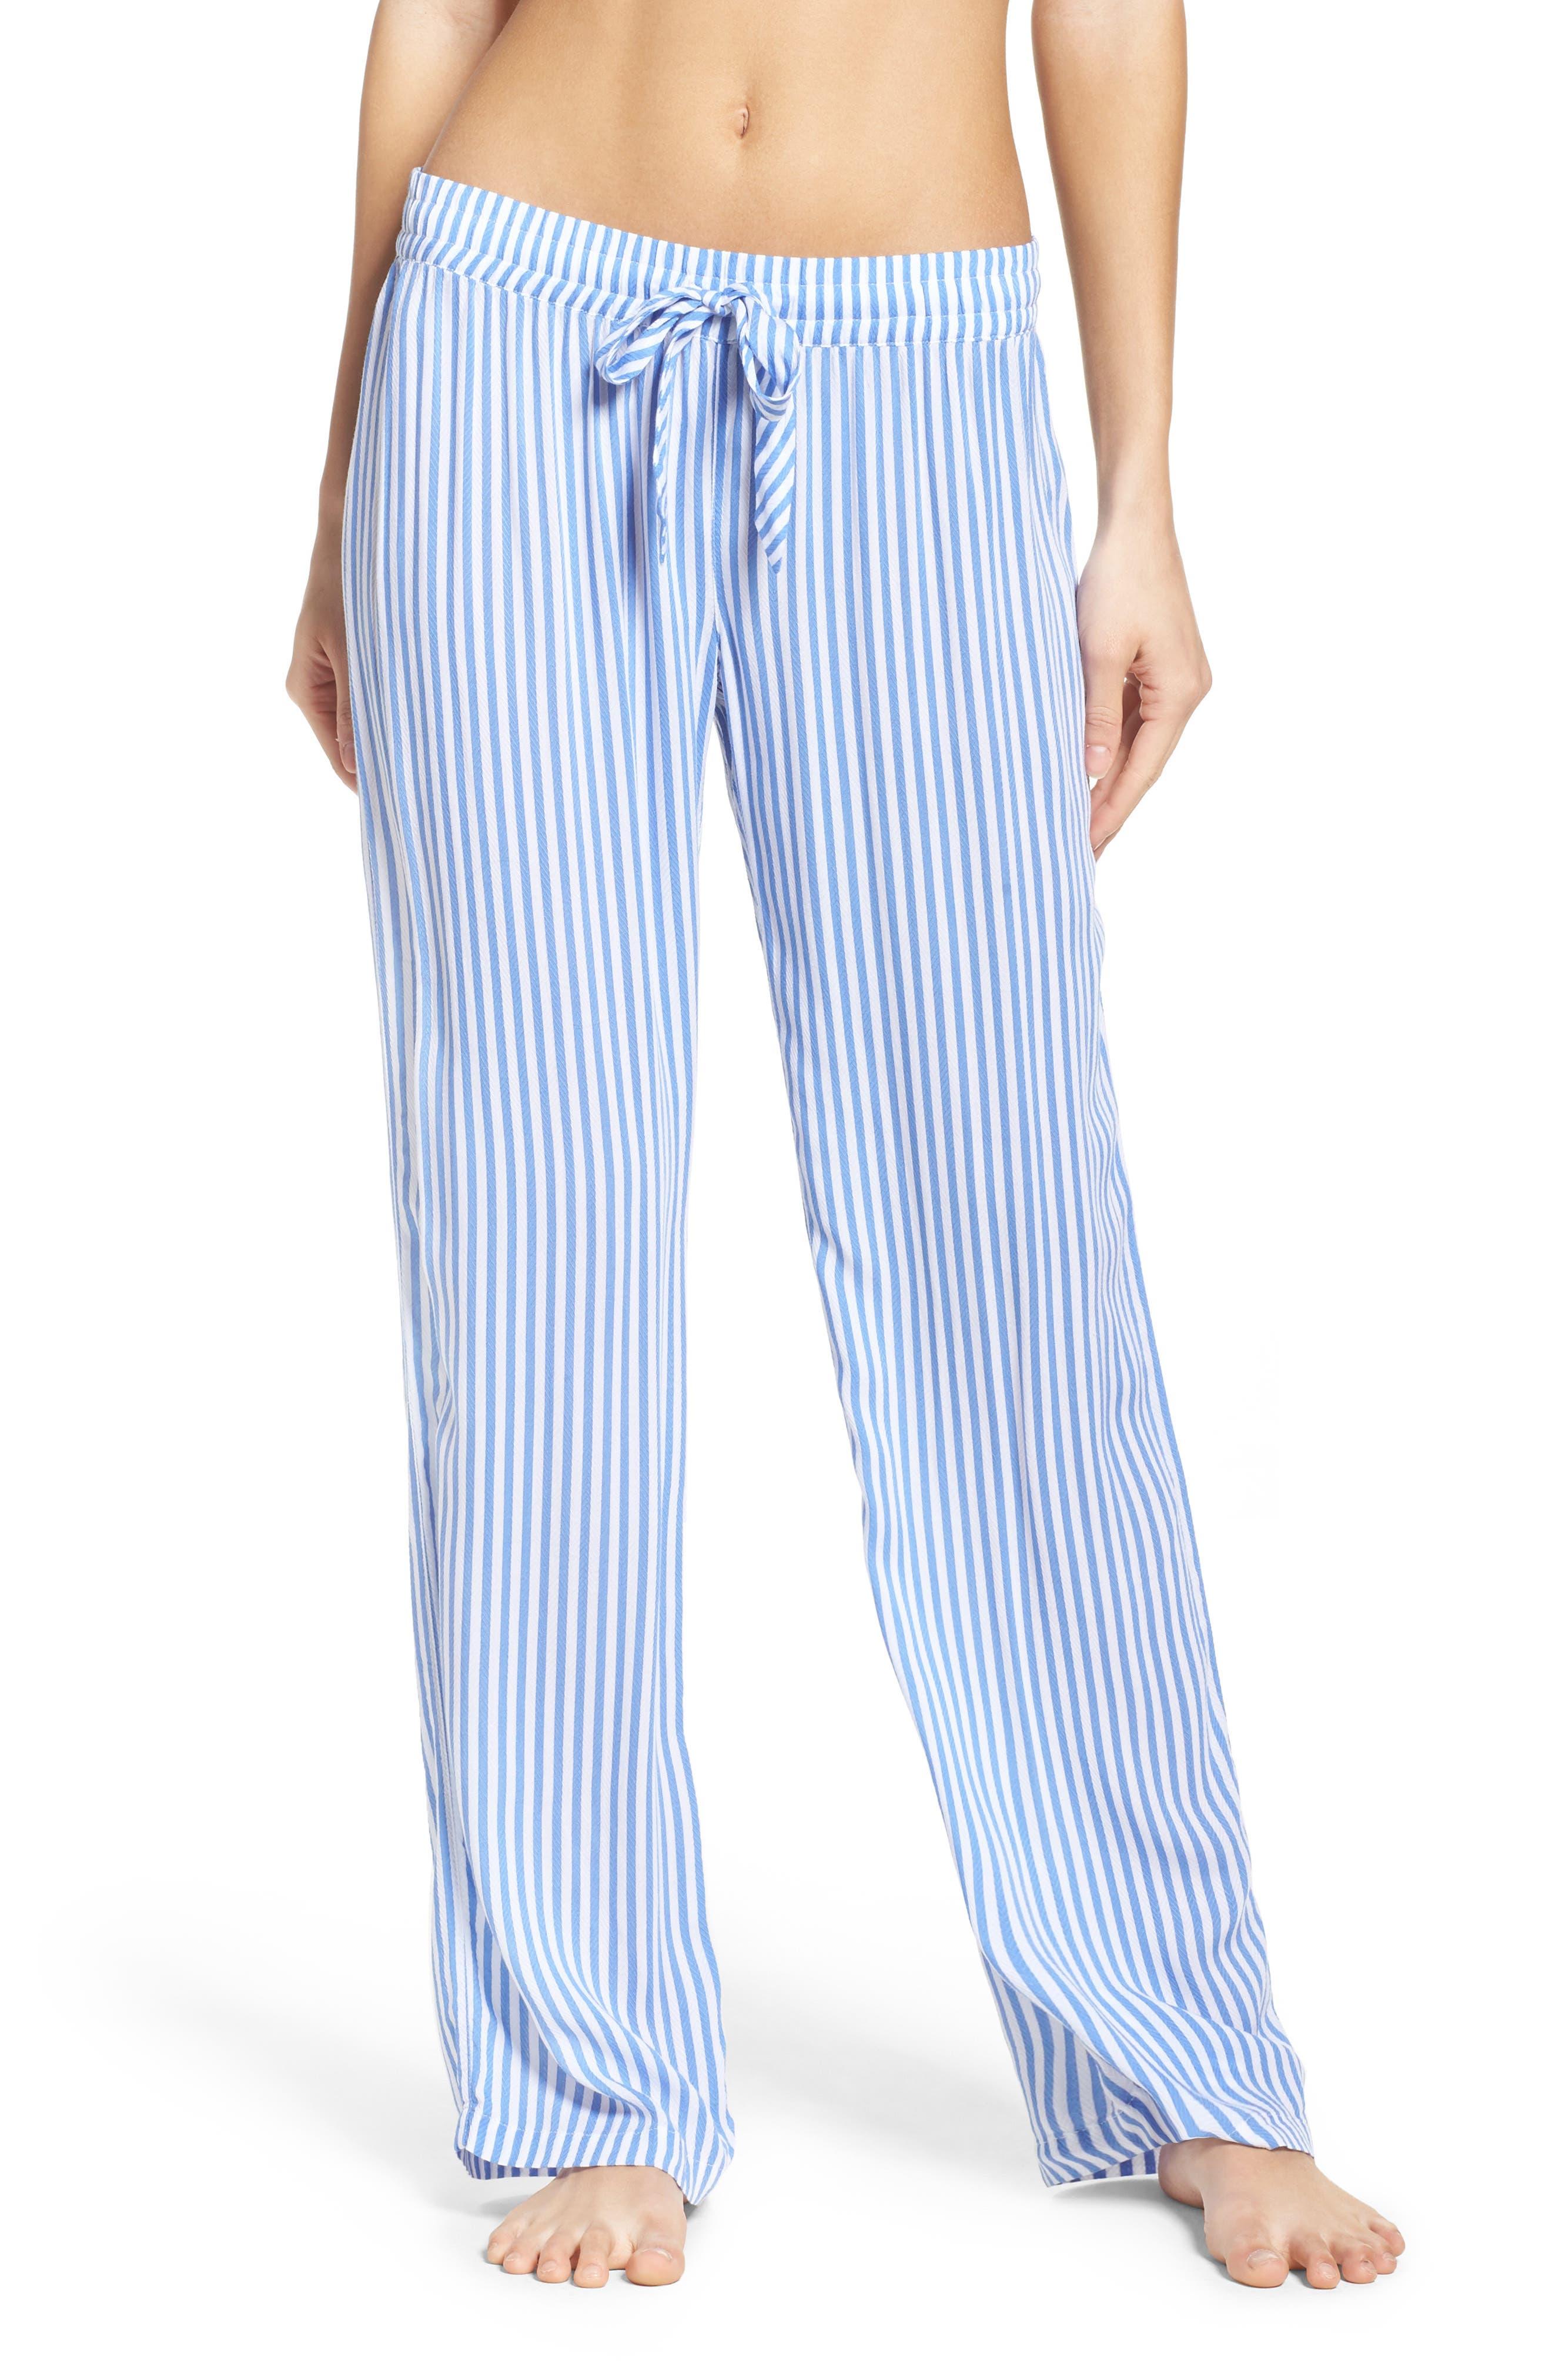 PJ Salvage Pants